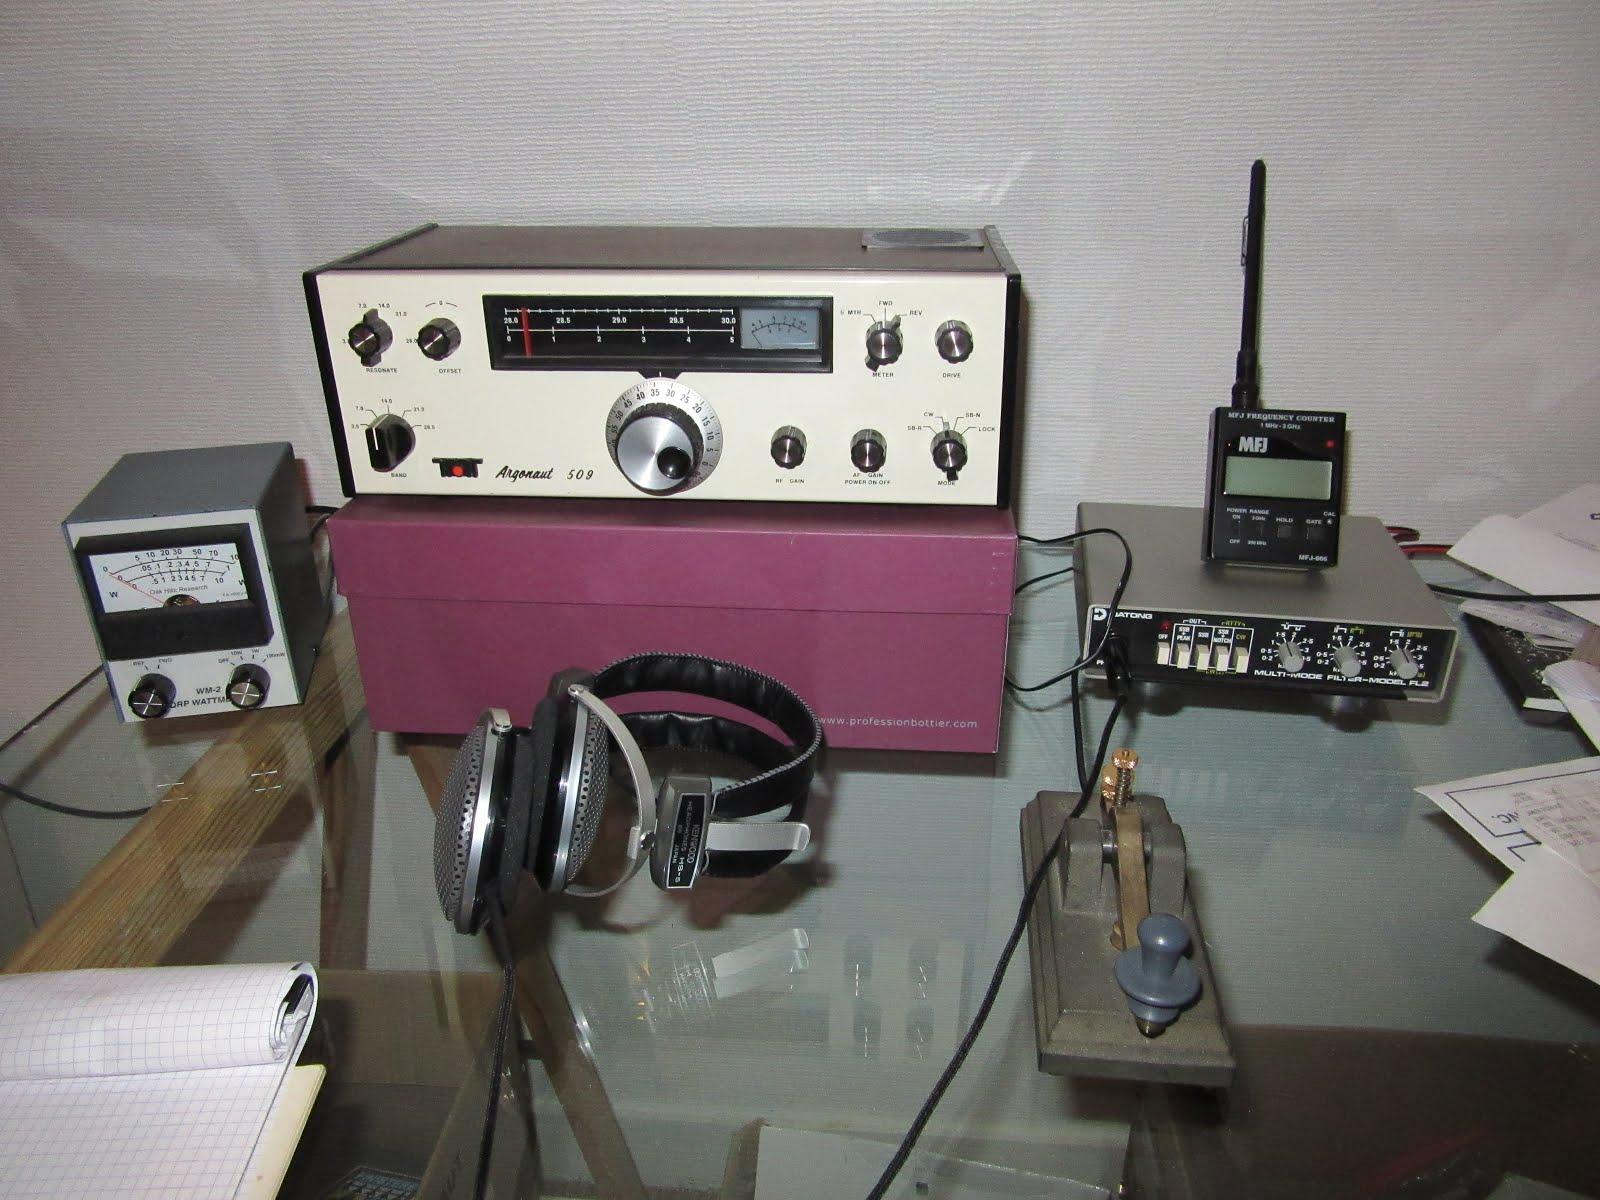 Ten Tec Argonaut 509 Station